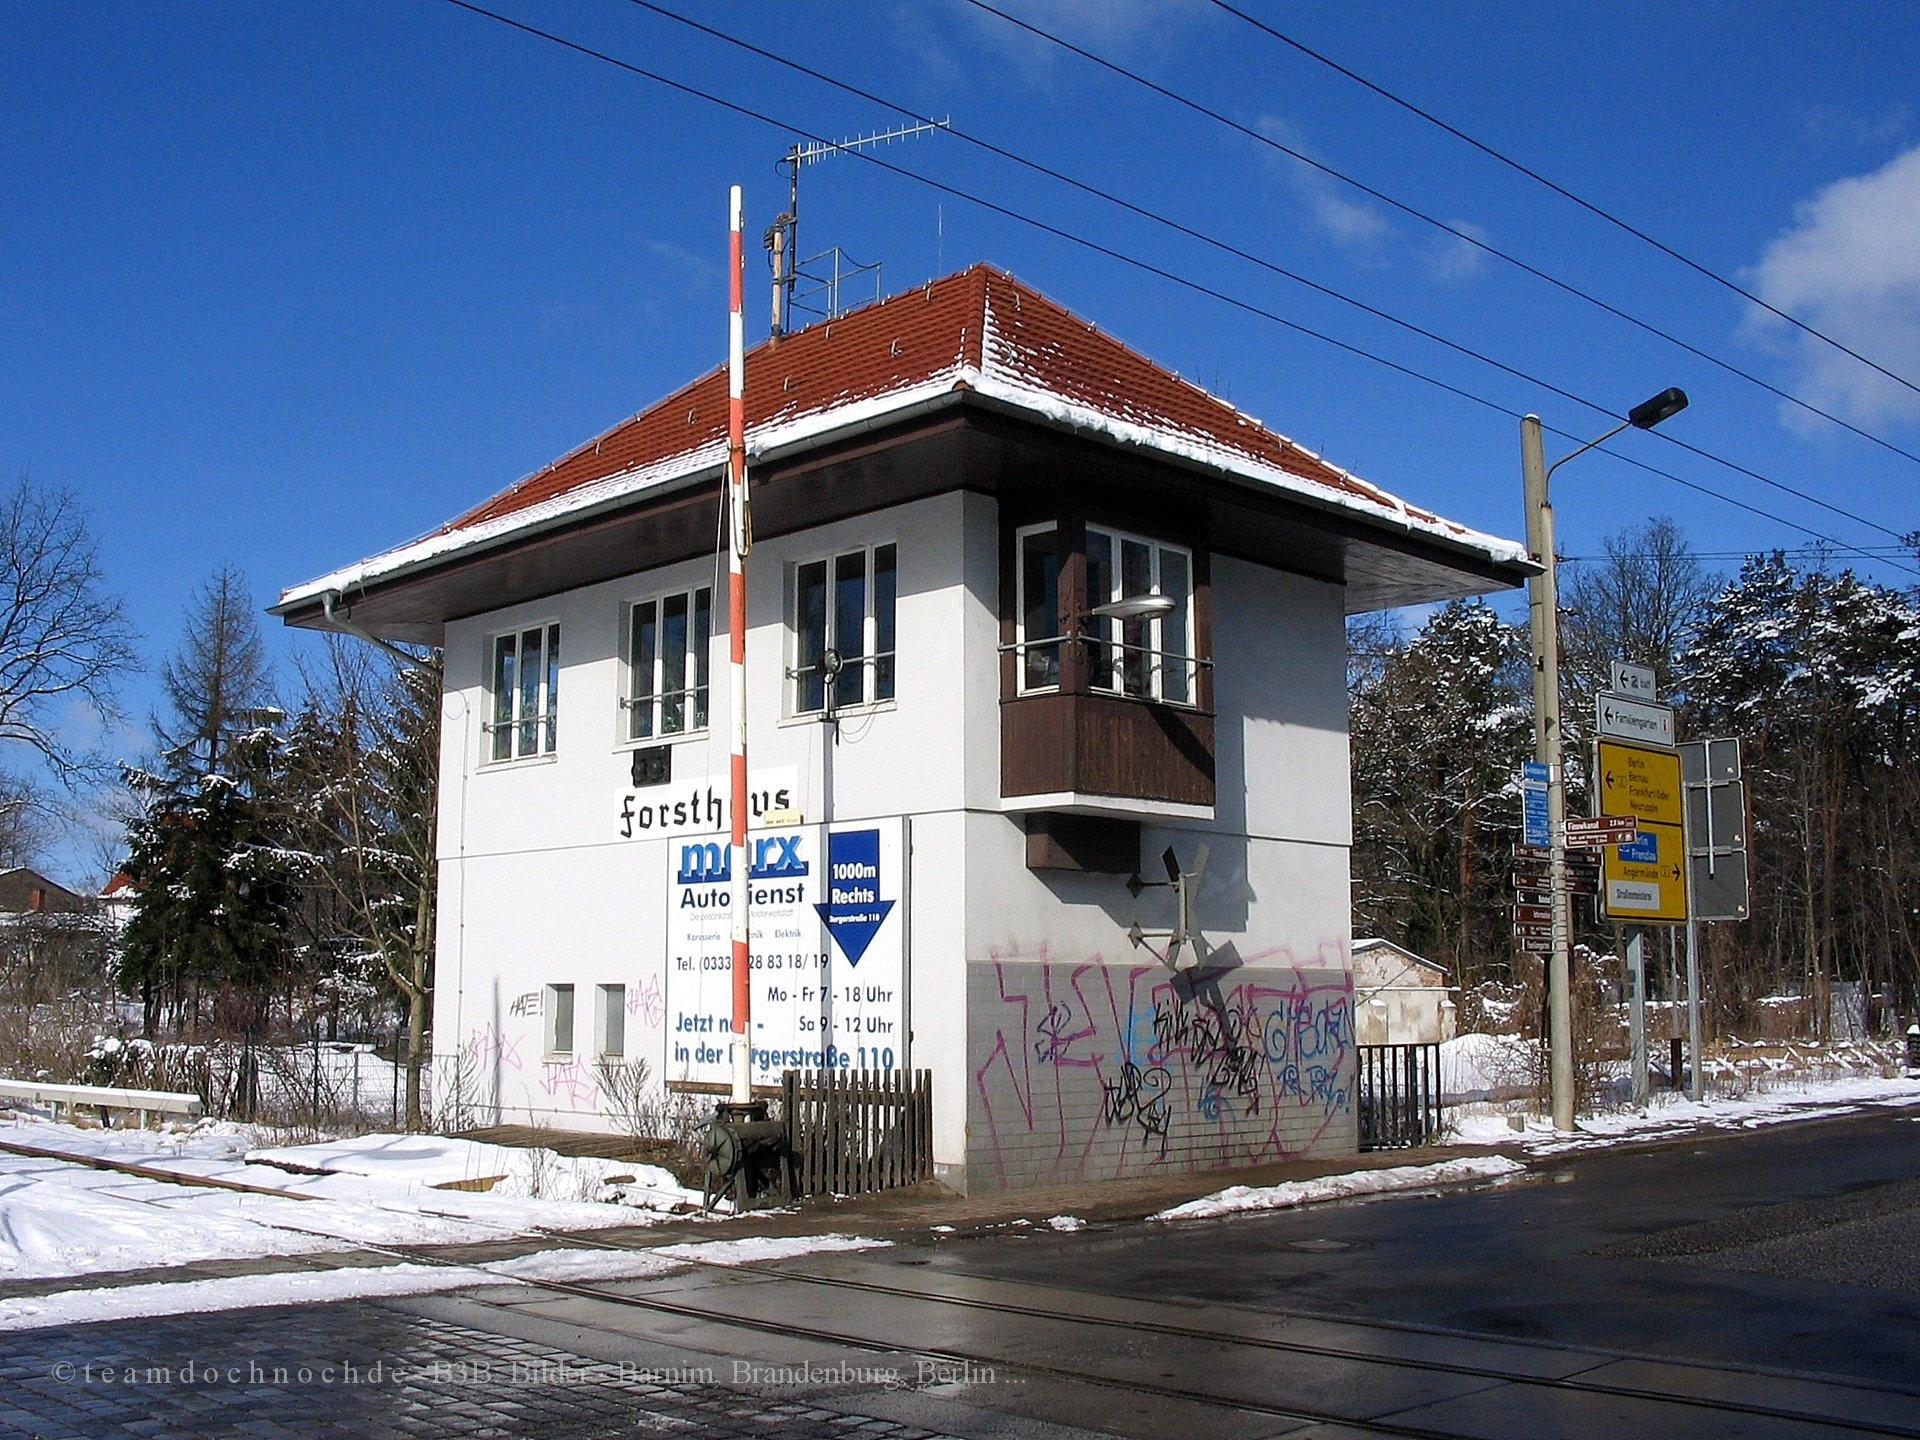 Bahnübergang Forsthaus in Eberswalde Nordend